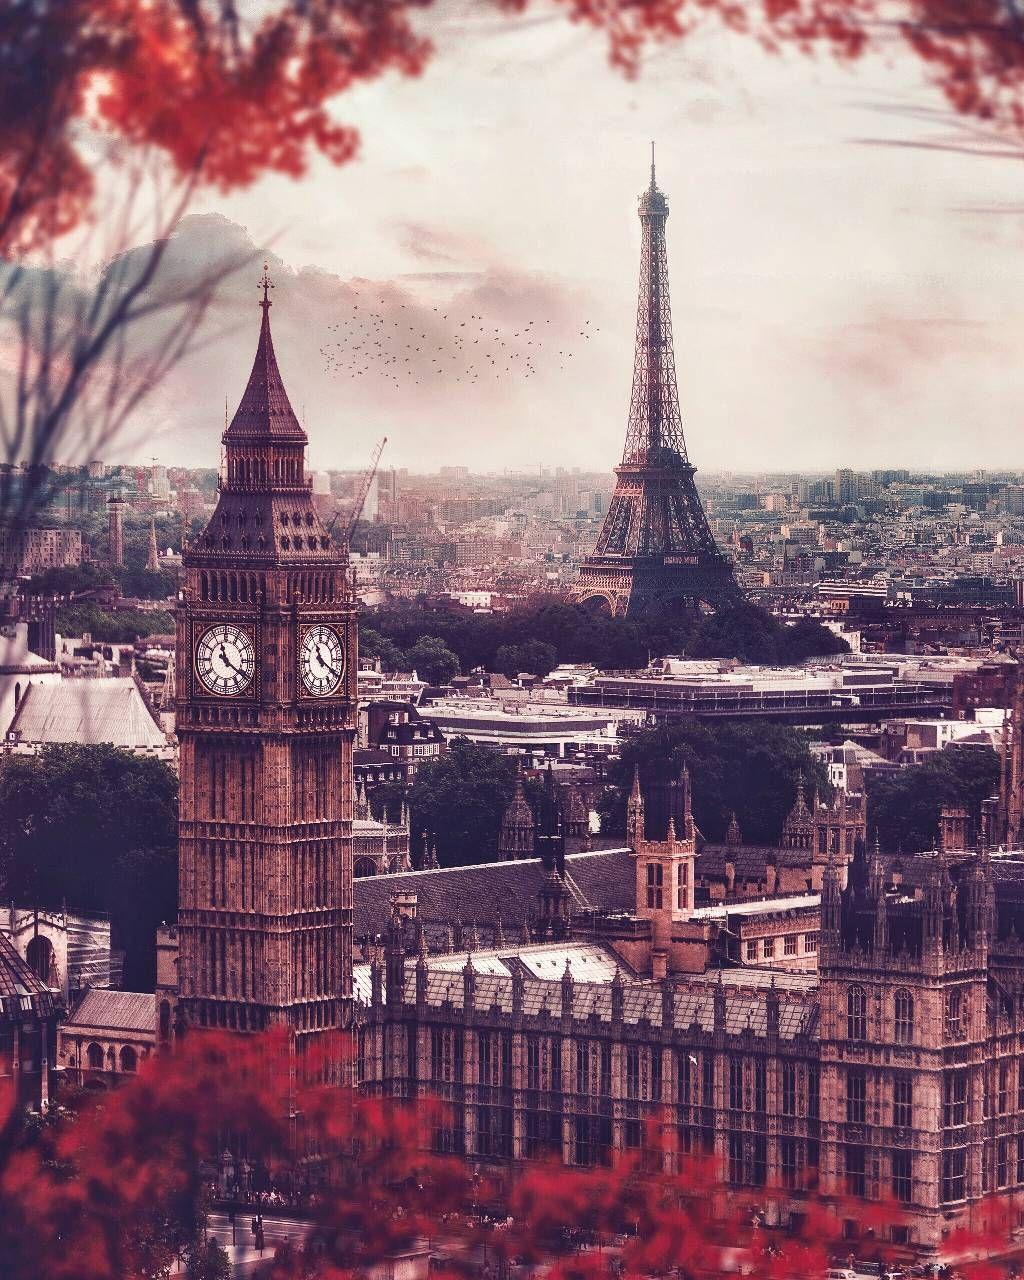 Download Paris London Wallpaper By Khaljdzz 61 Free On Zedge Now Browse Millions Of Popular Autmn Wallpapers And London Wallpaper Paris Wallpaper London Aesthetic wallpaper city london